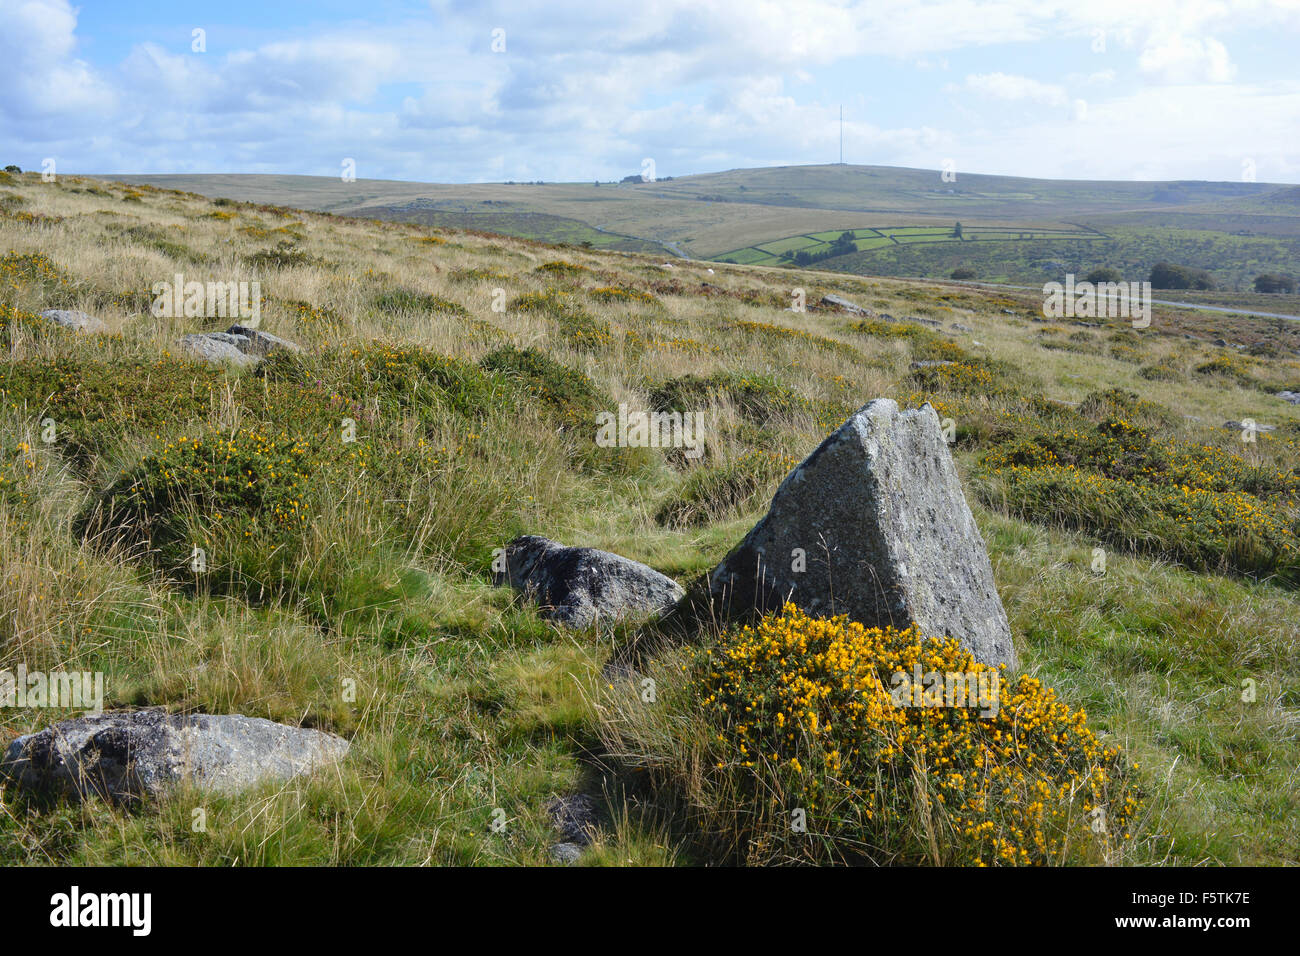 Landscape near the Staple Tors, looking towards Princetown, Dartmoor National Park, Devon, England - Stock Image